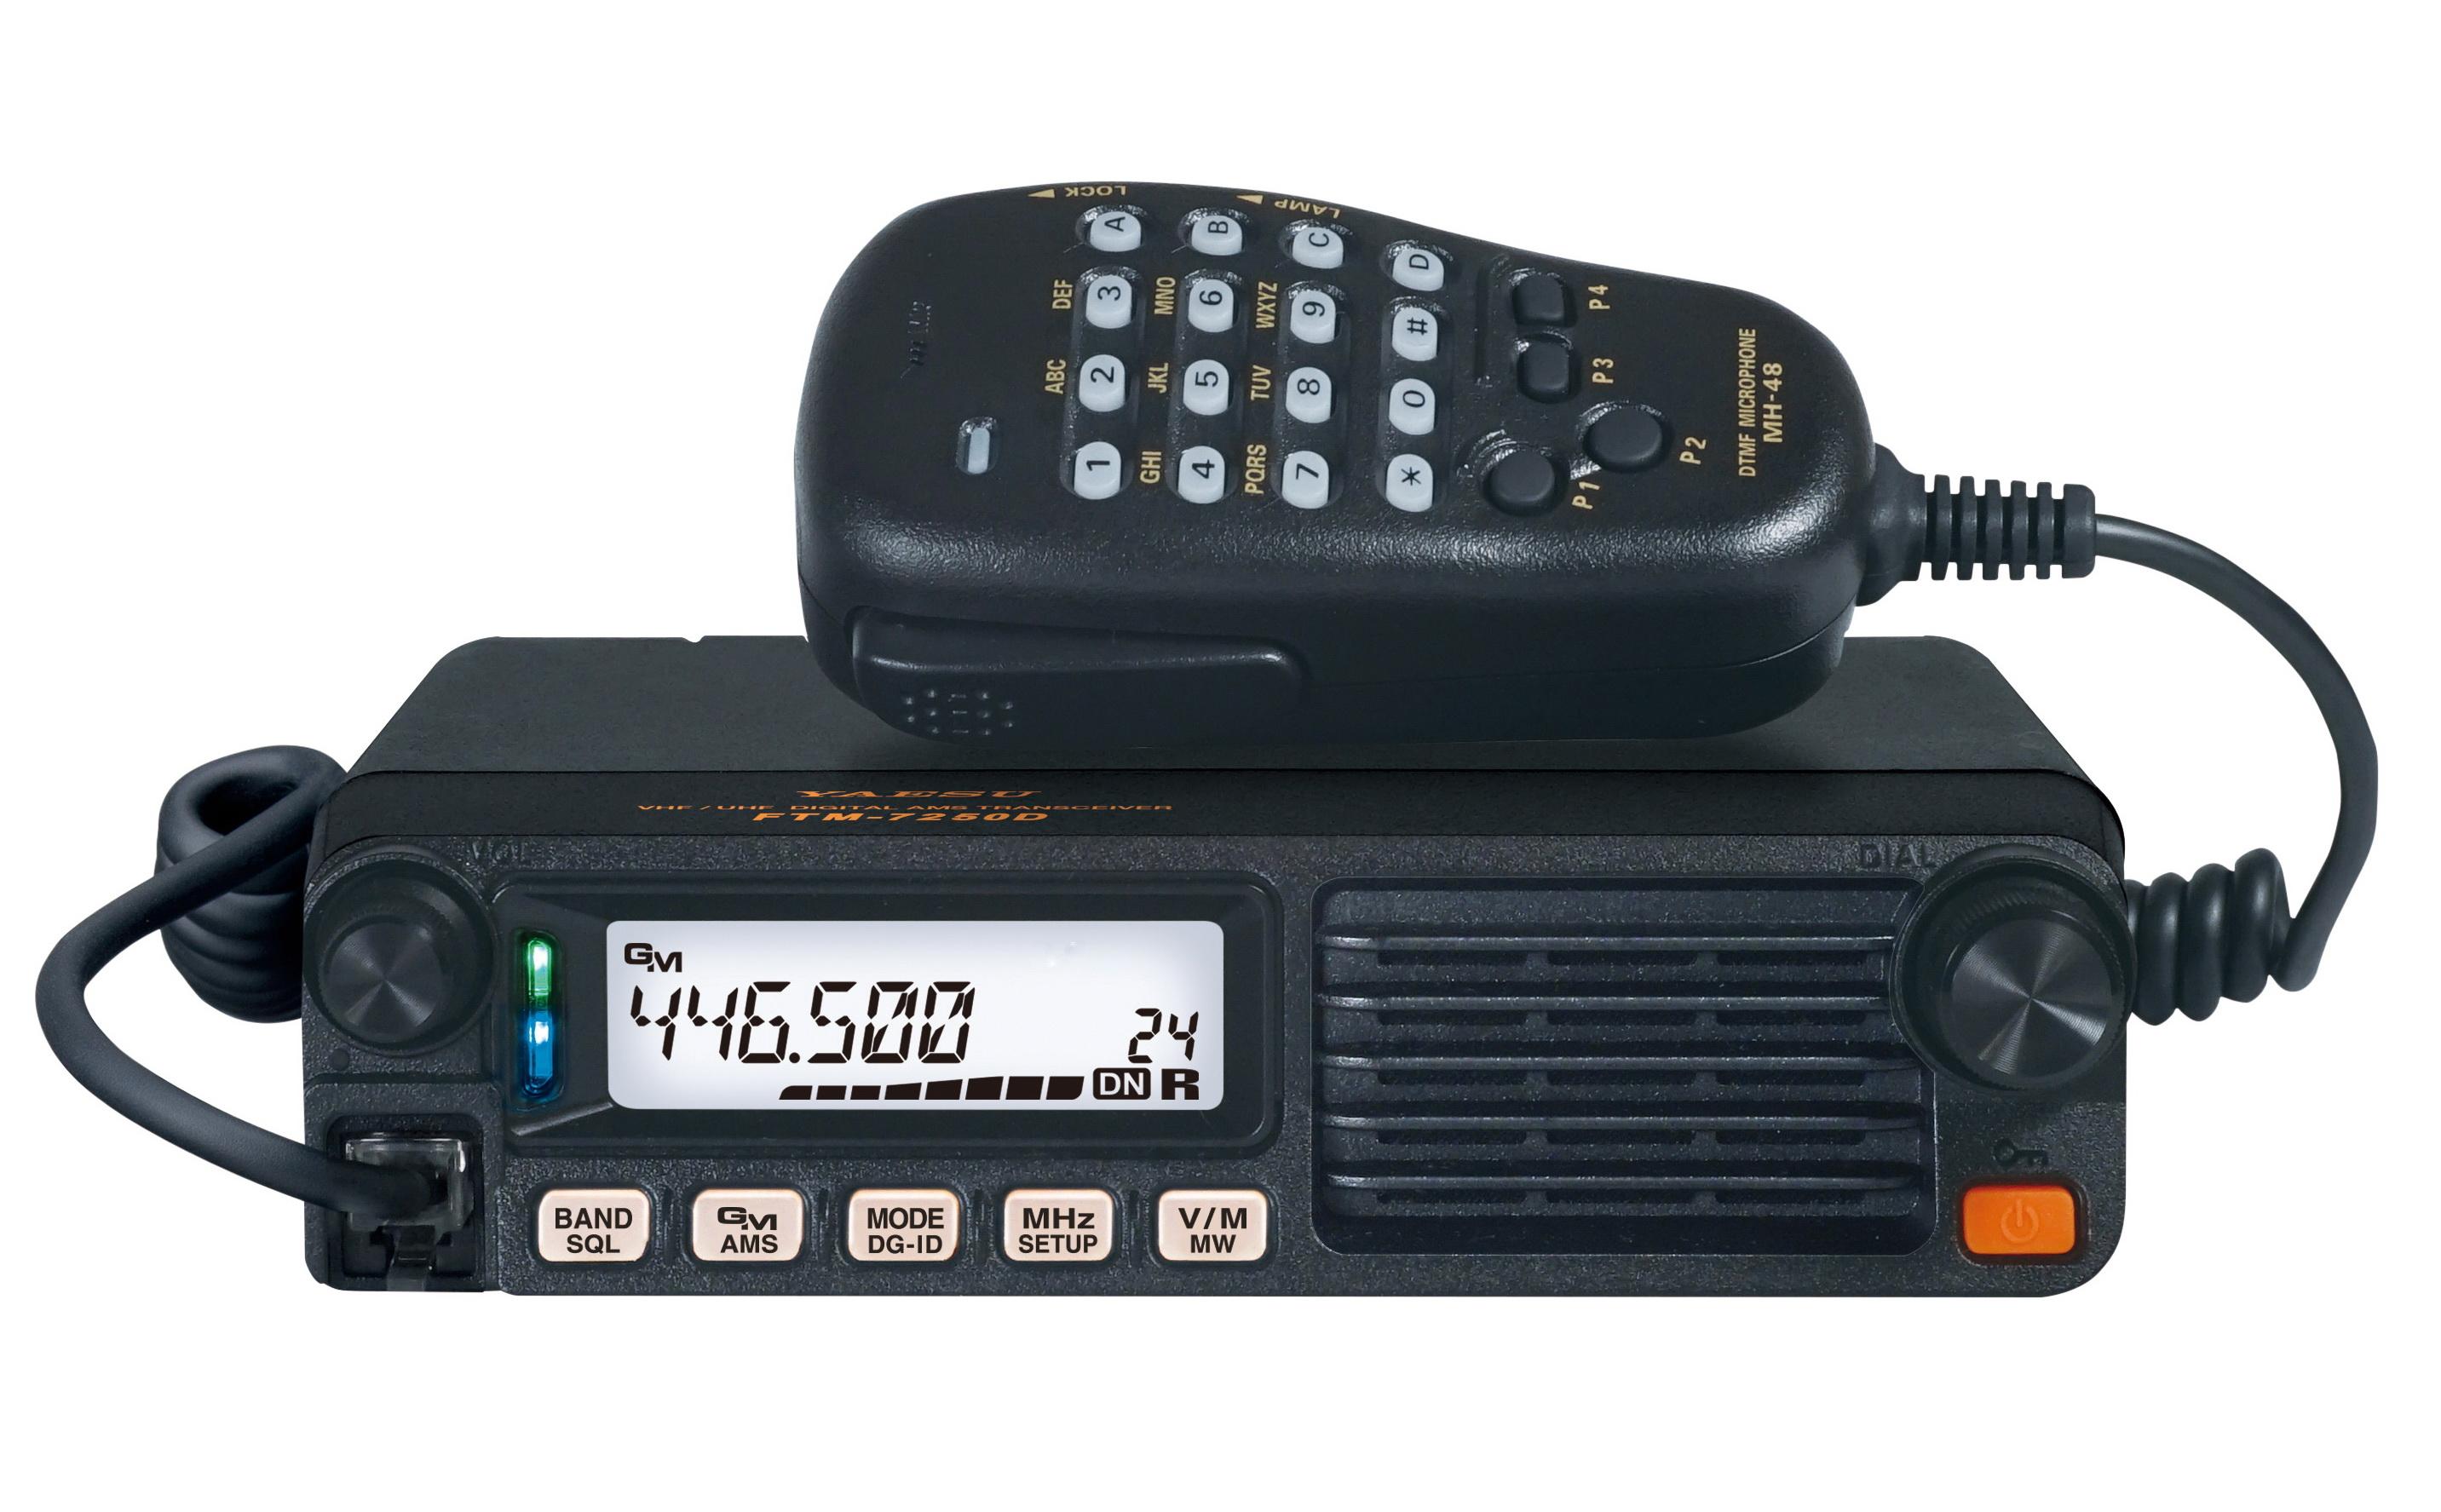 Yaesu Ftm 7250de Funktechnik Bielefeld Professionelles Equipment Ic 484 Am Radio Receiver Fr Gehobene Ansprche